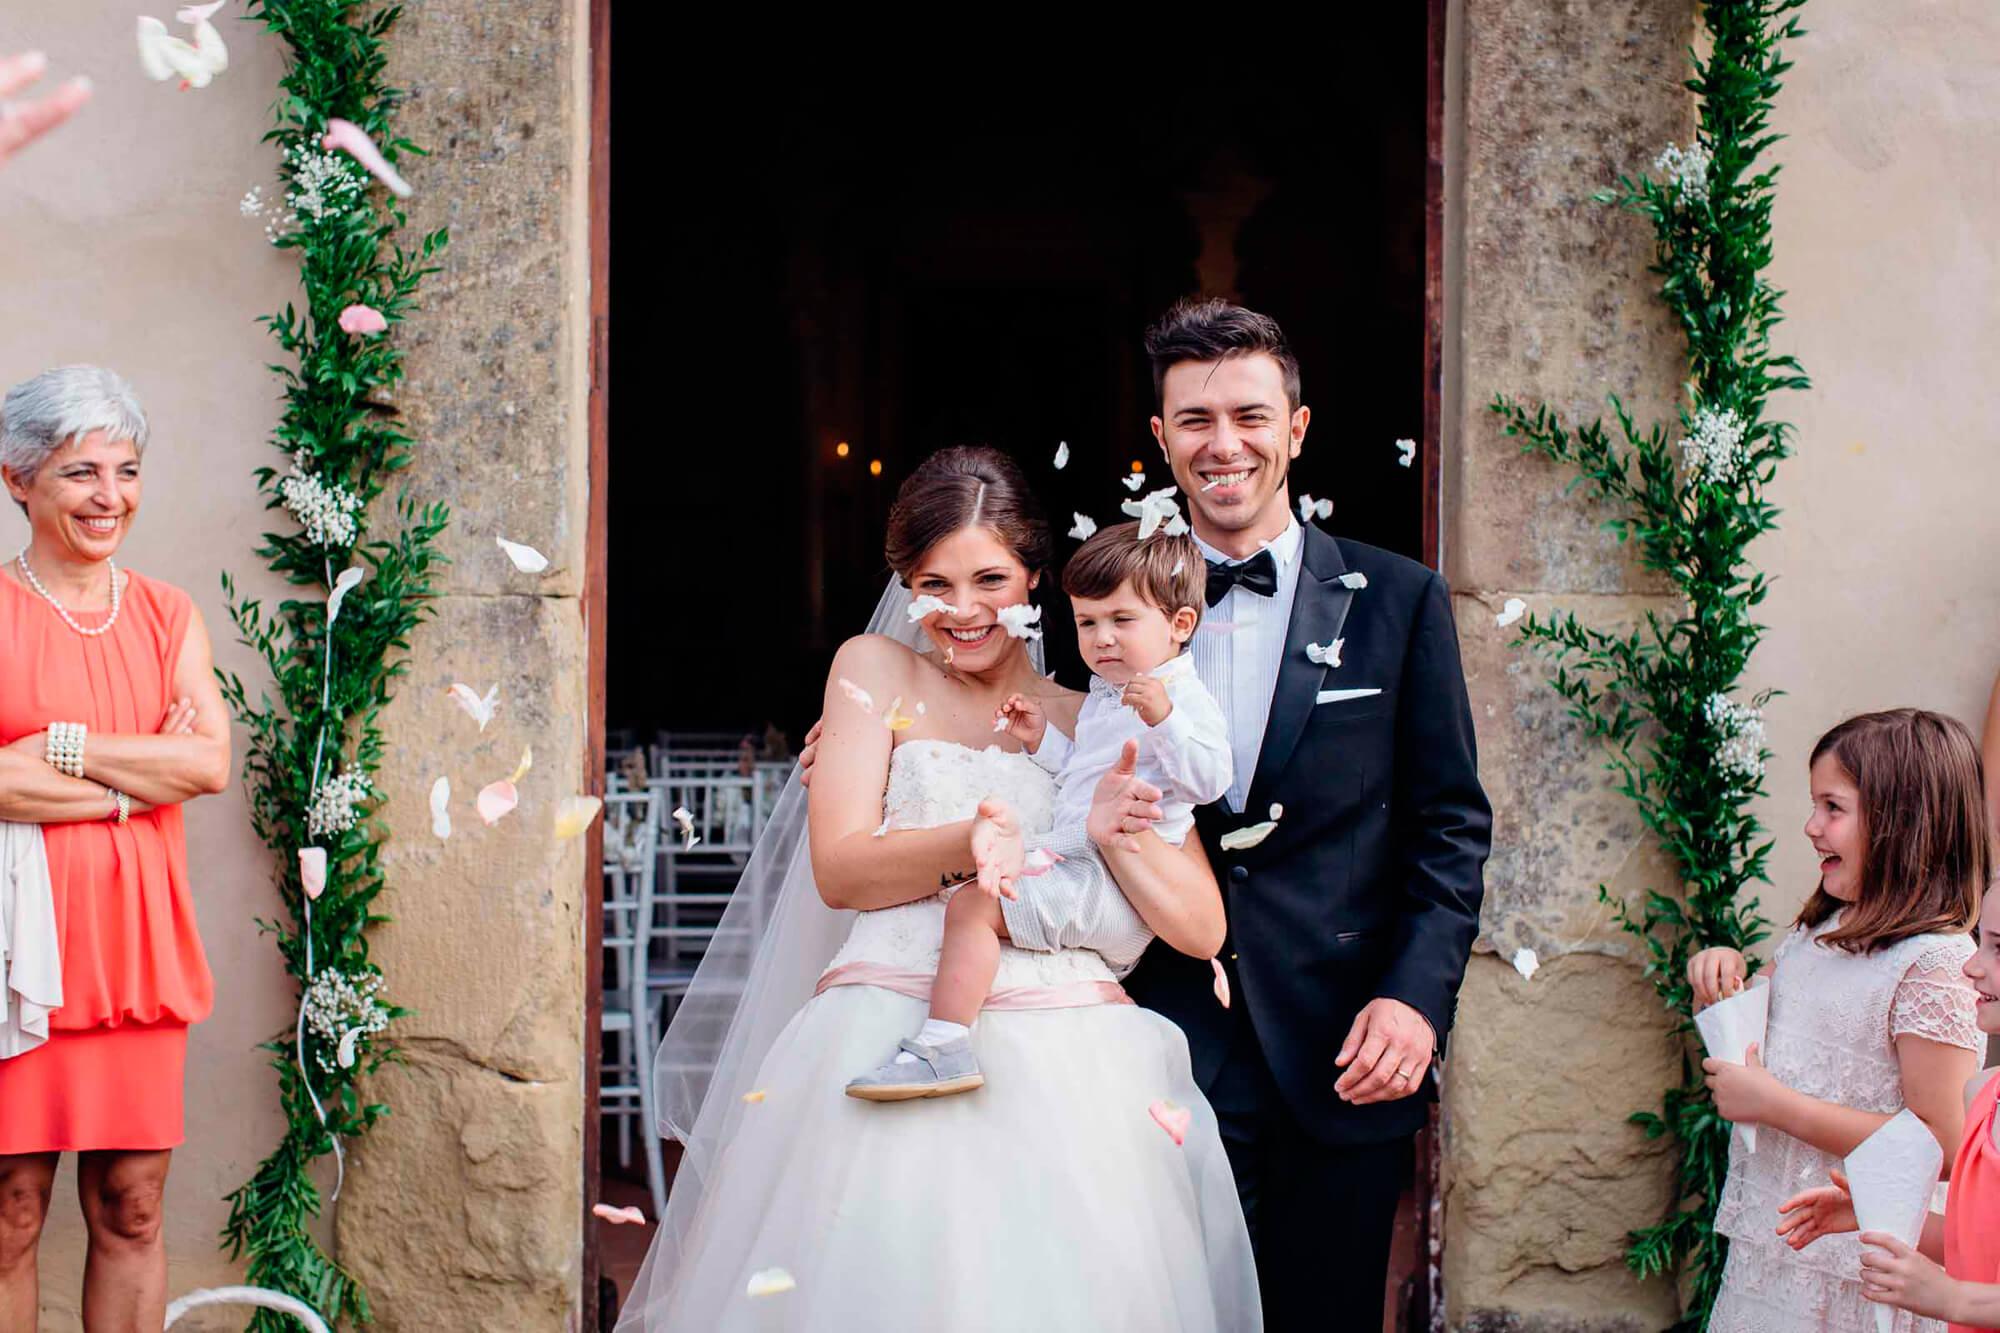 070-arezzo-wedding-photographer.jpg